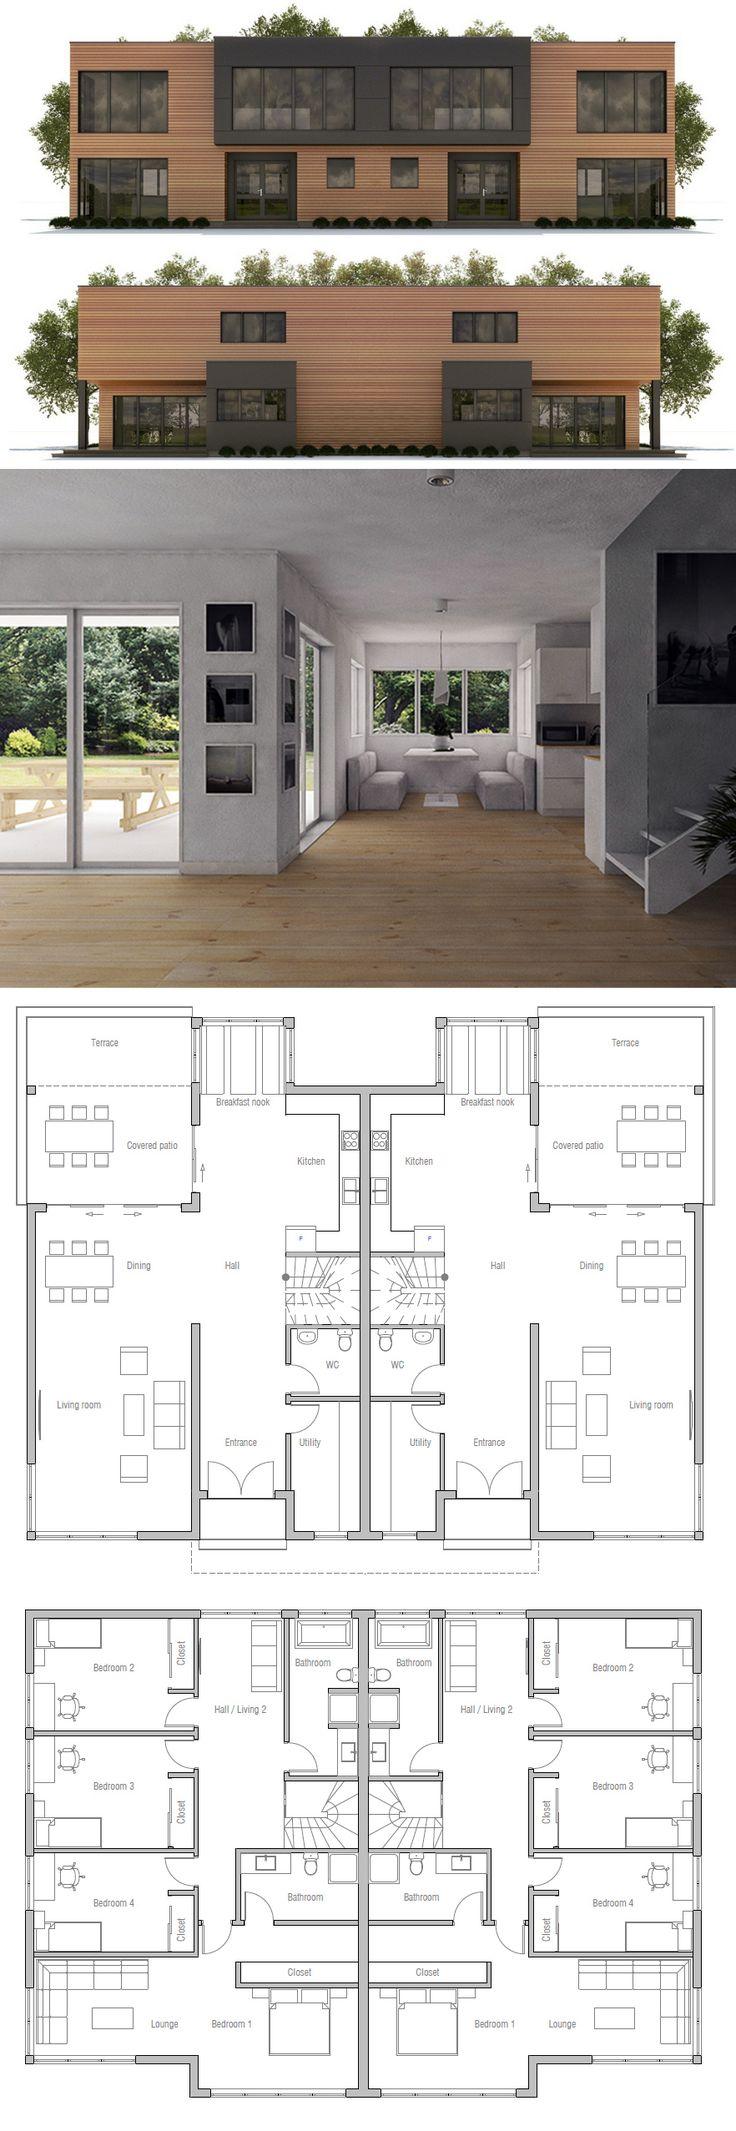 Best 25 Duplex house plans ideas on Pinterest